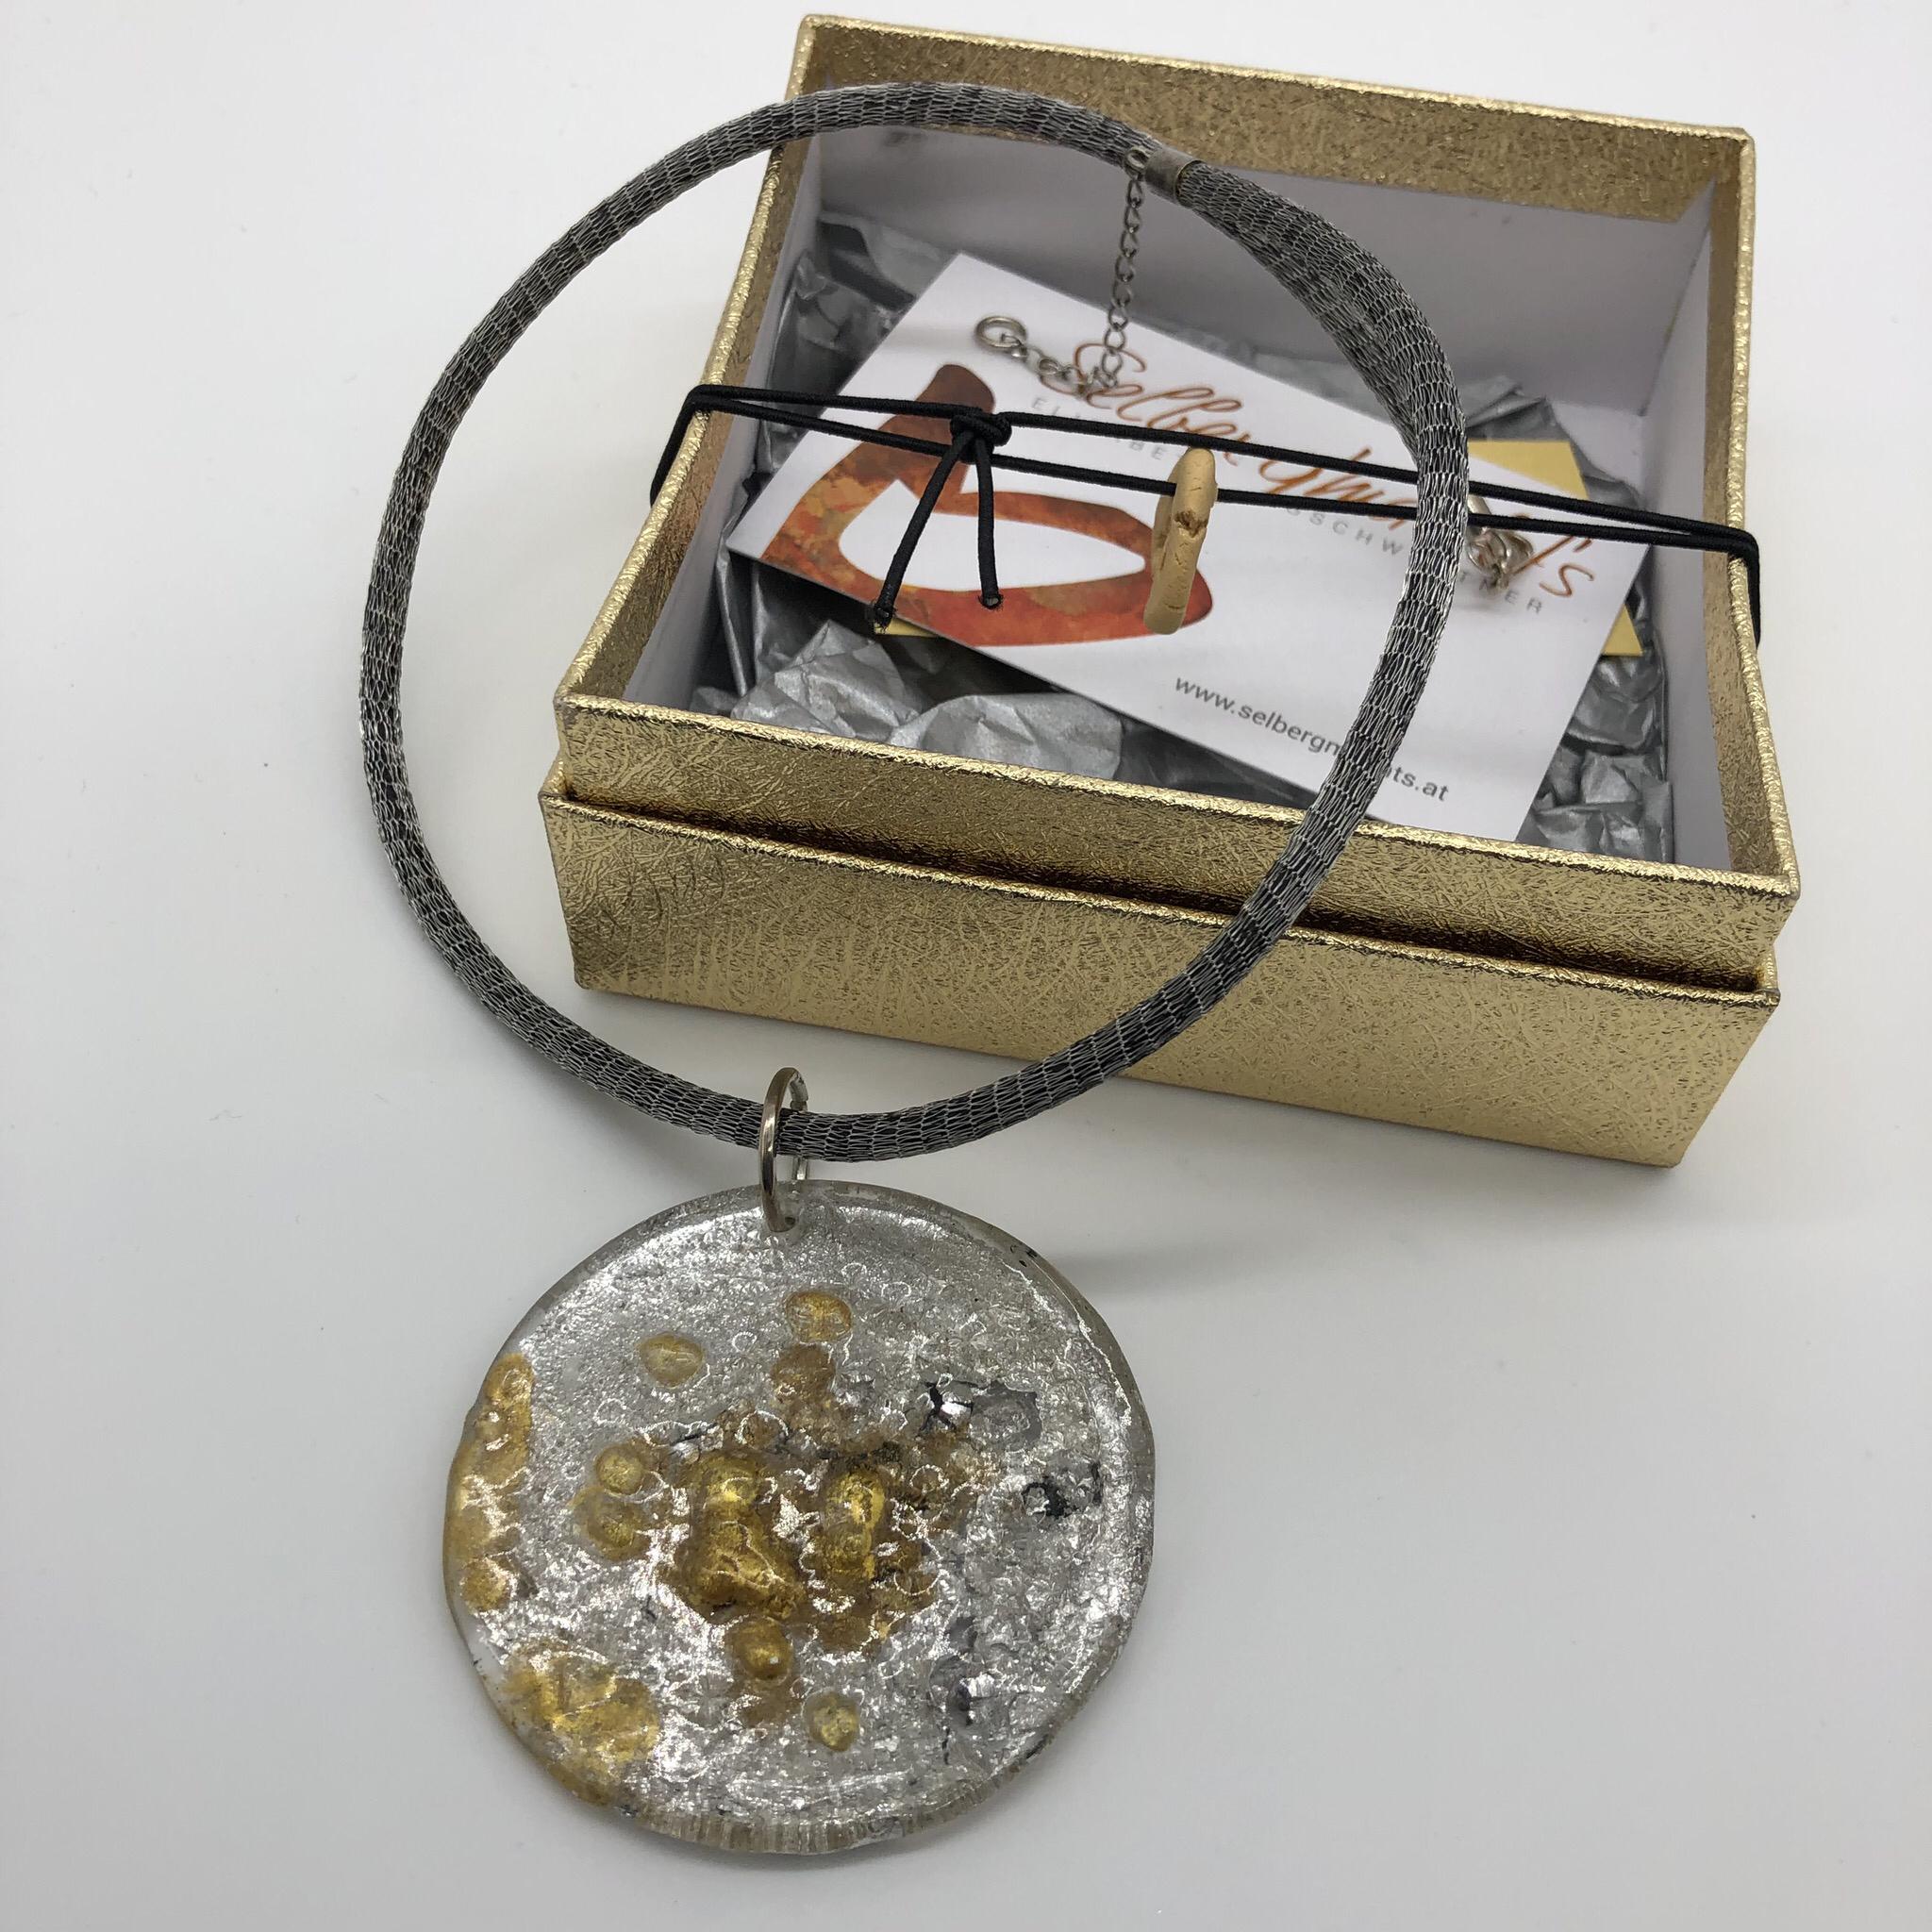 Anhänger Kunststoffgranulat silber/gold Blattmetall - beidseitig tragbar 25176